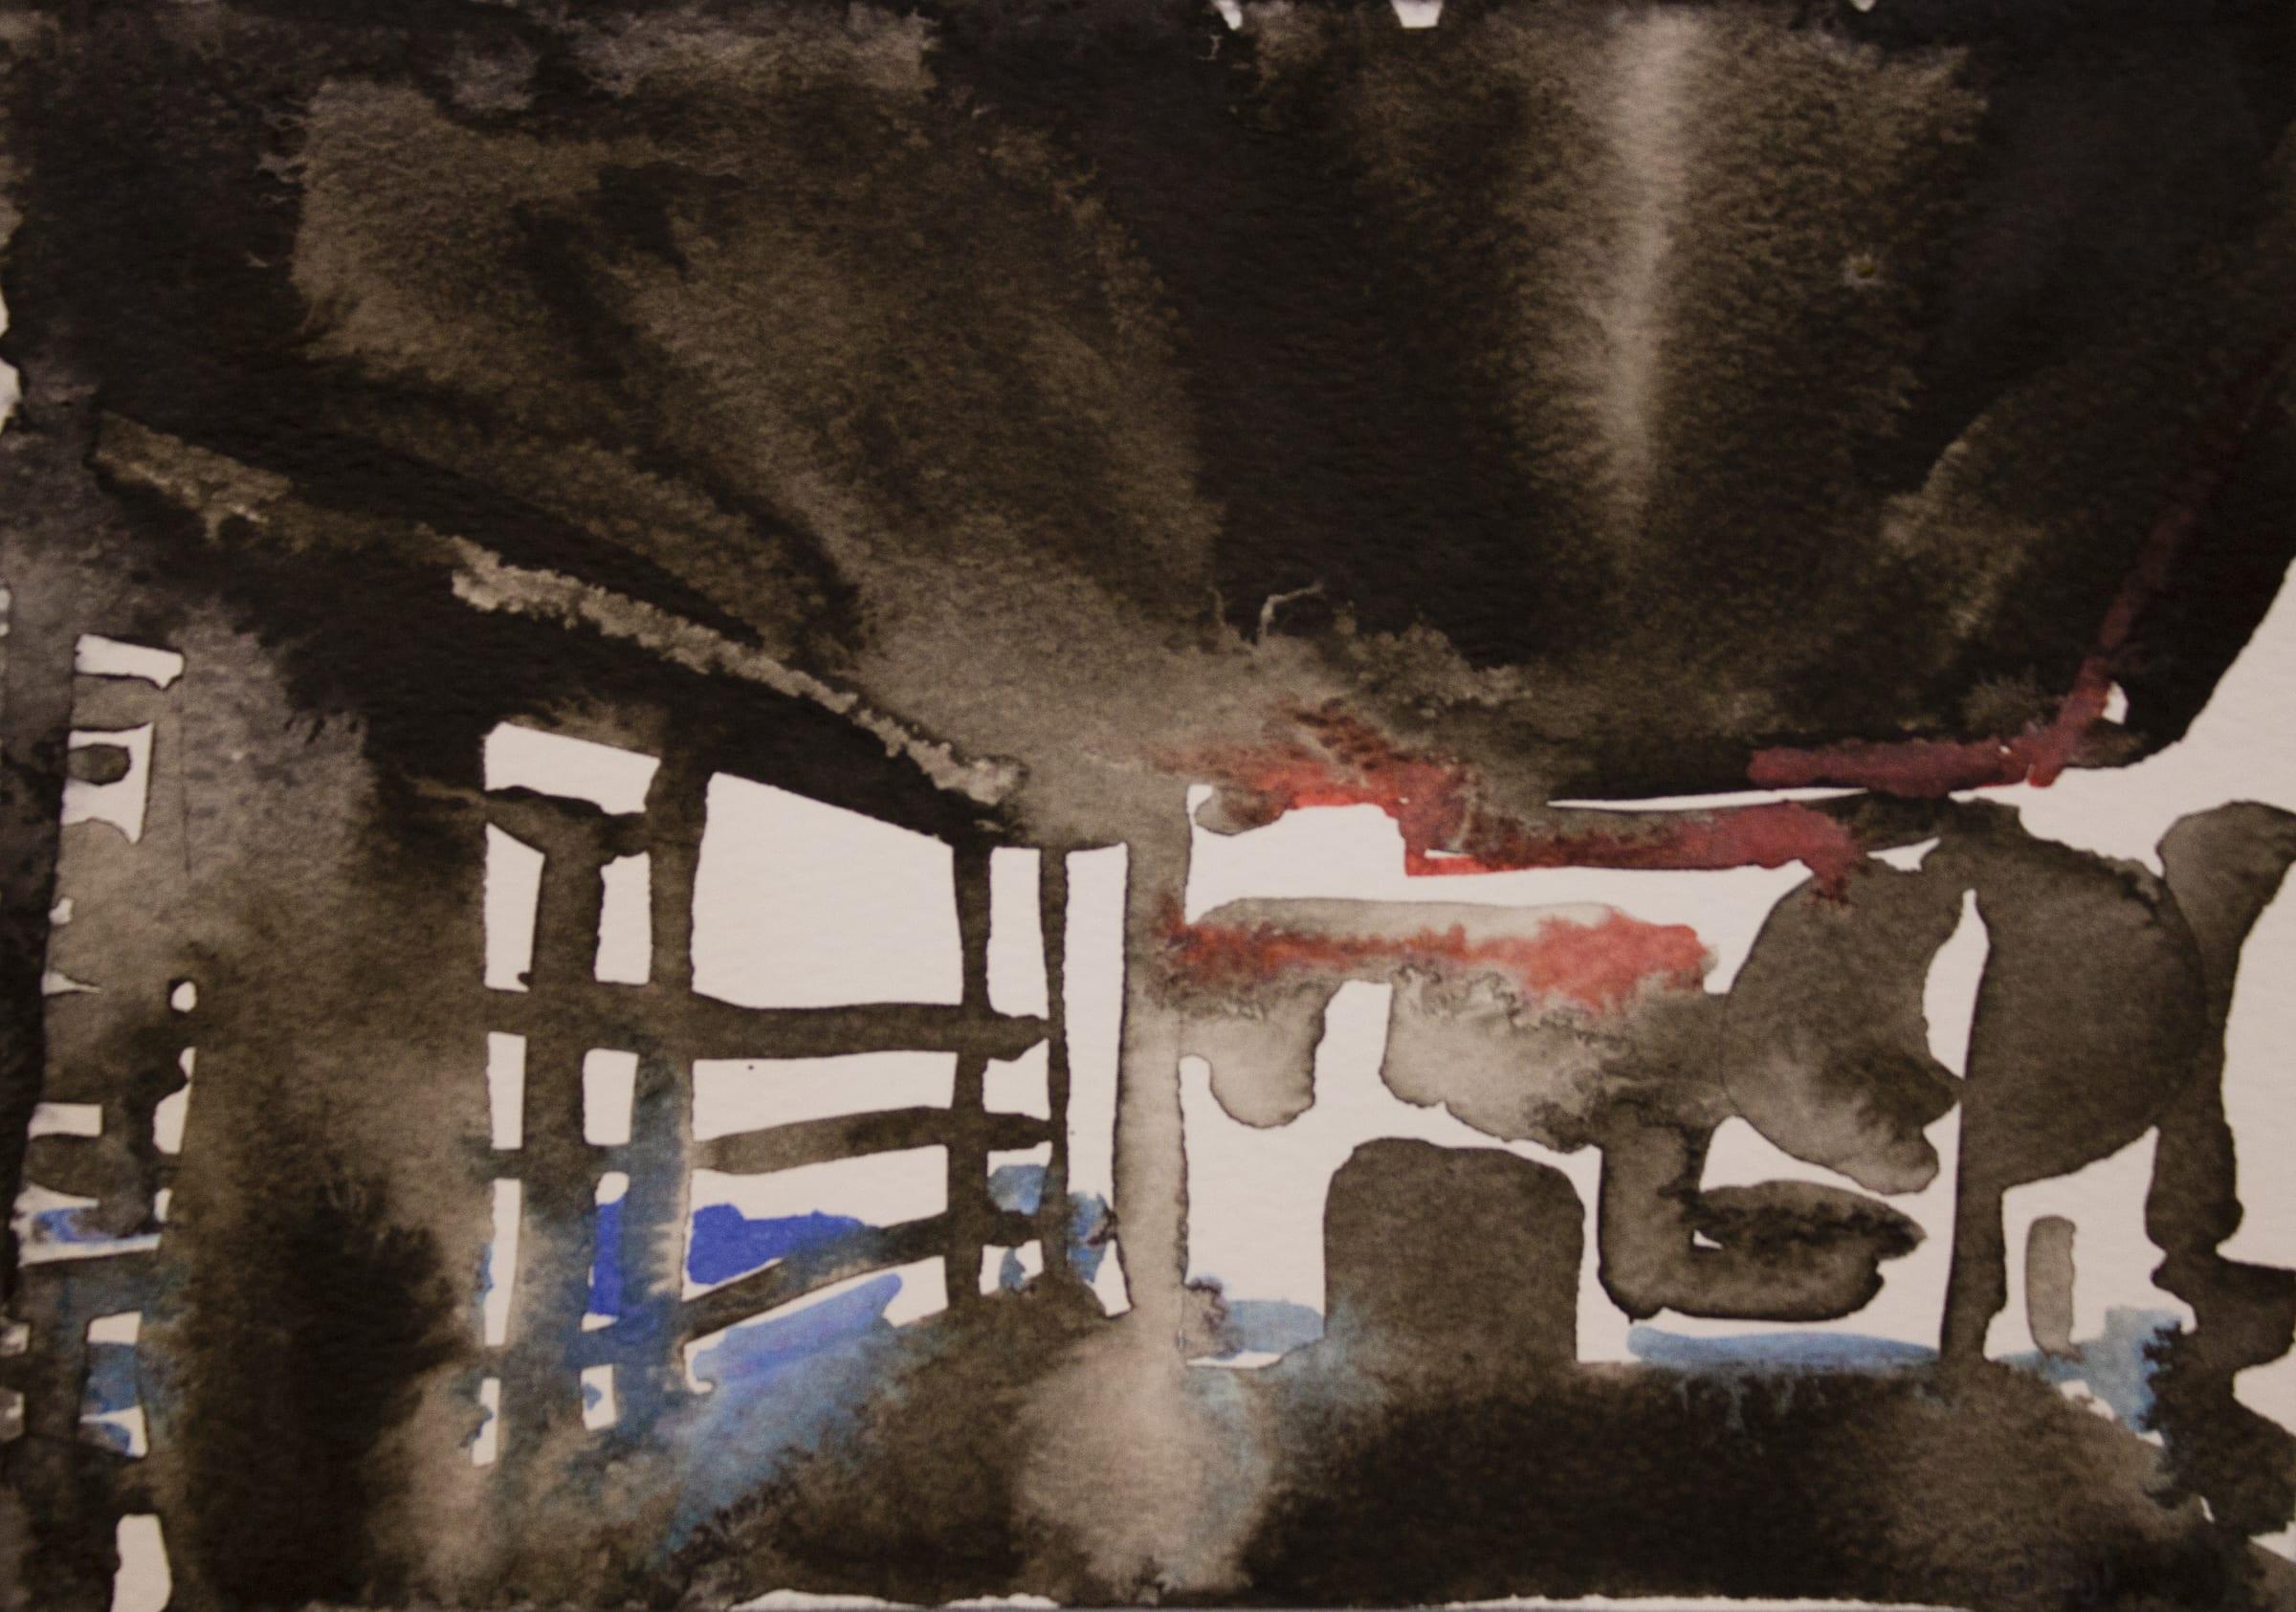 <span class=&#34;link fancybox-details-link&#34;><a href=&#34;/artists/88-louise-van-der-bijl/works/2278-louise-van-der-bijl-inktober-day-16-2018/&#34;>View Detail Page</a></span><div class=&#34;artist&#34;><strong>Louise Van Der Bijl</strong></div> <div class=&#34;title&#34;><em>Inktober Day 16</em>, 2018</div> <div class=&#34;medium&#34;>Ink On Paper</div> <div class=&#34;dimensions&#34;>15cm x 21cm</div><div class=&#34;price&#34;>R400.00</div>